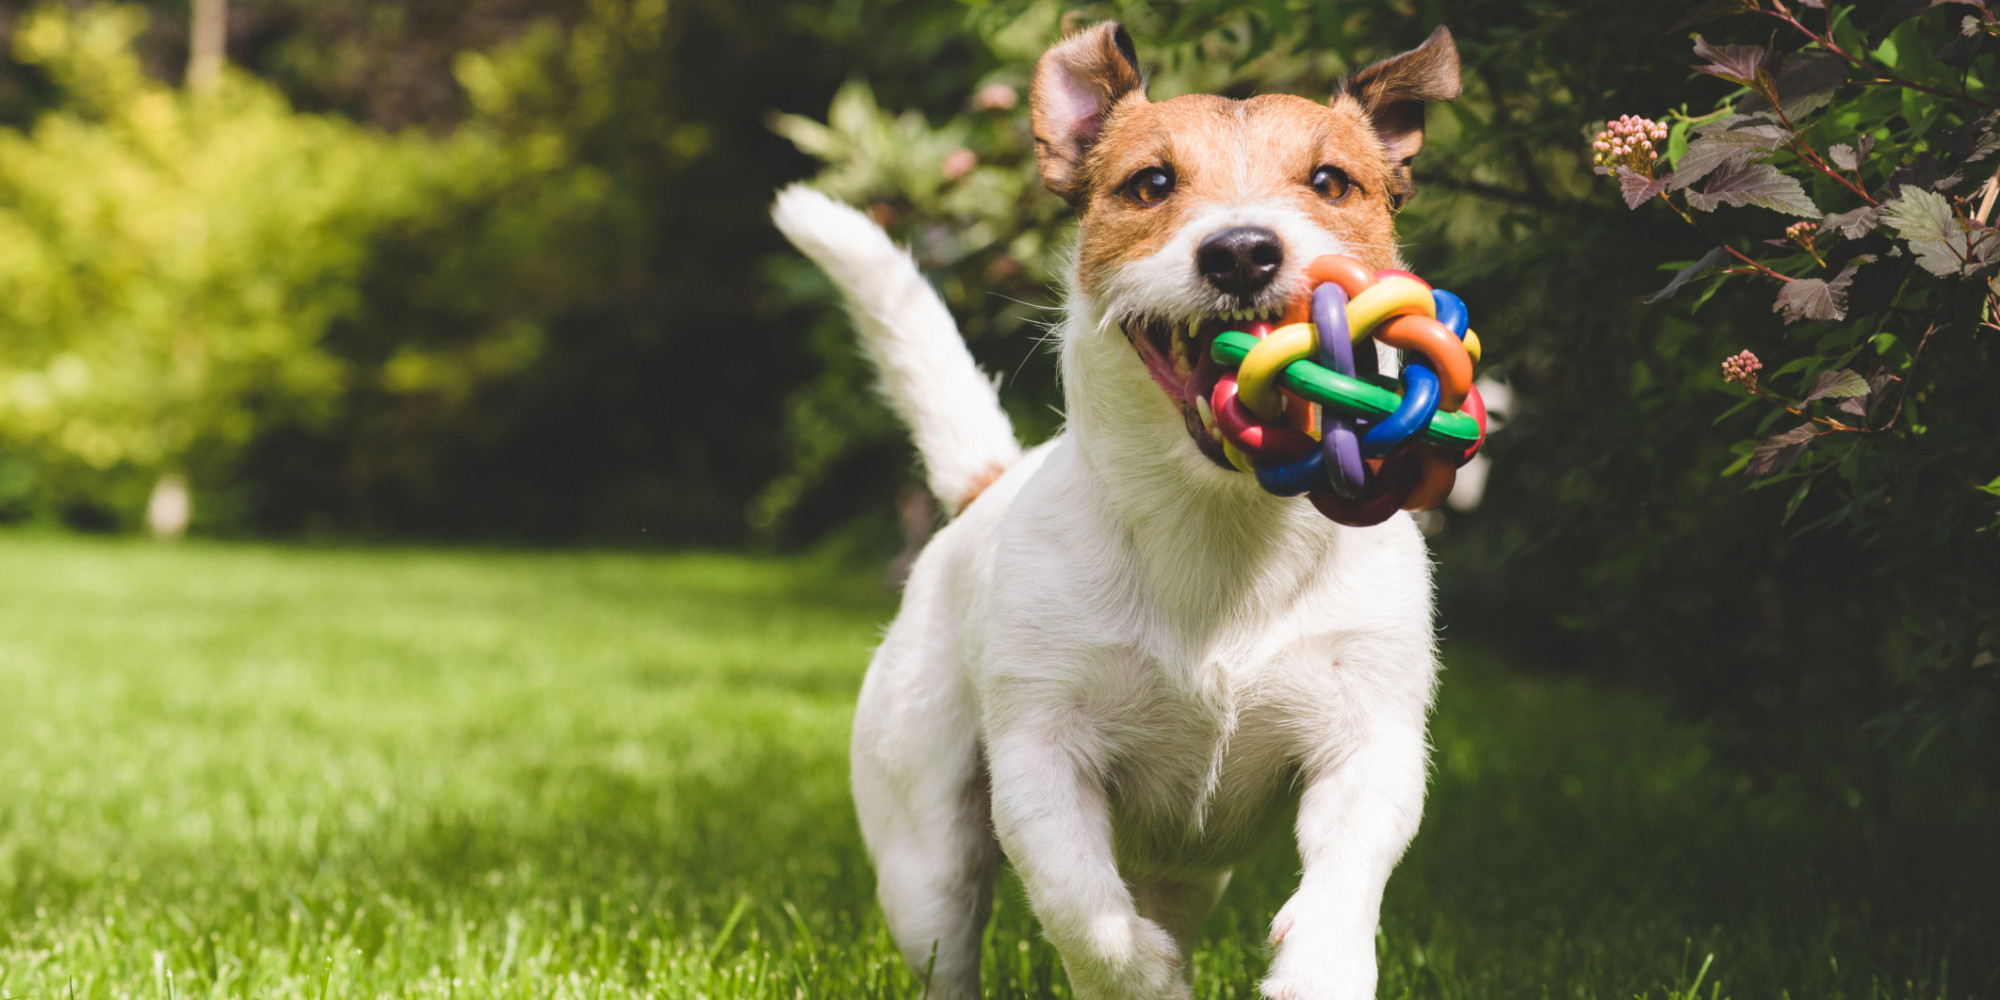 http://i.huffpost.com/gen/3929856/images/o-DOGS-facebook.jpg